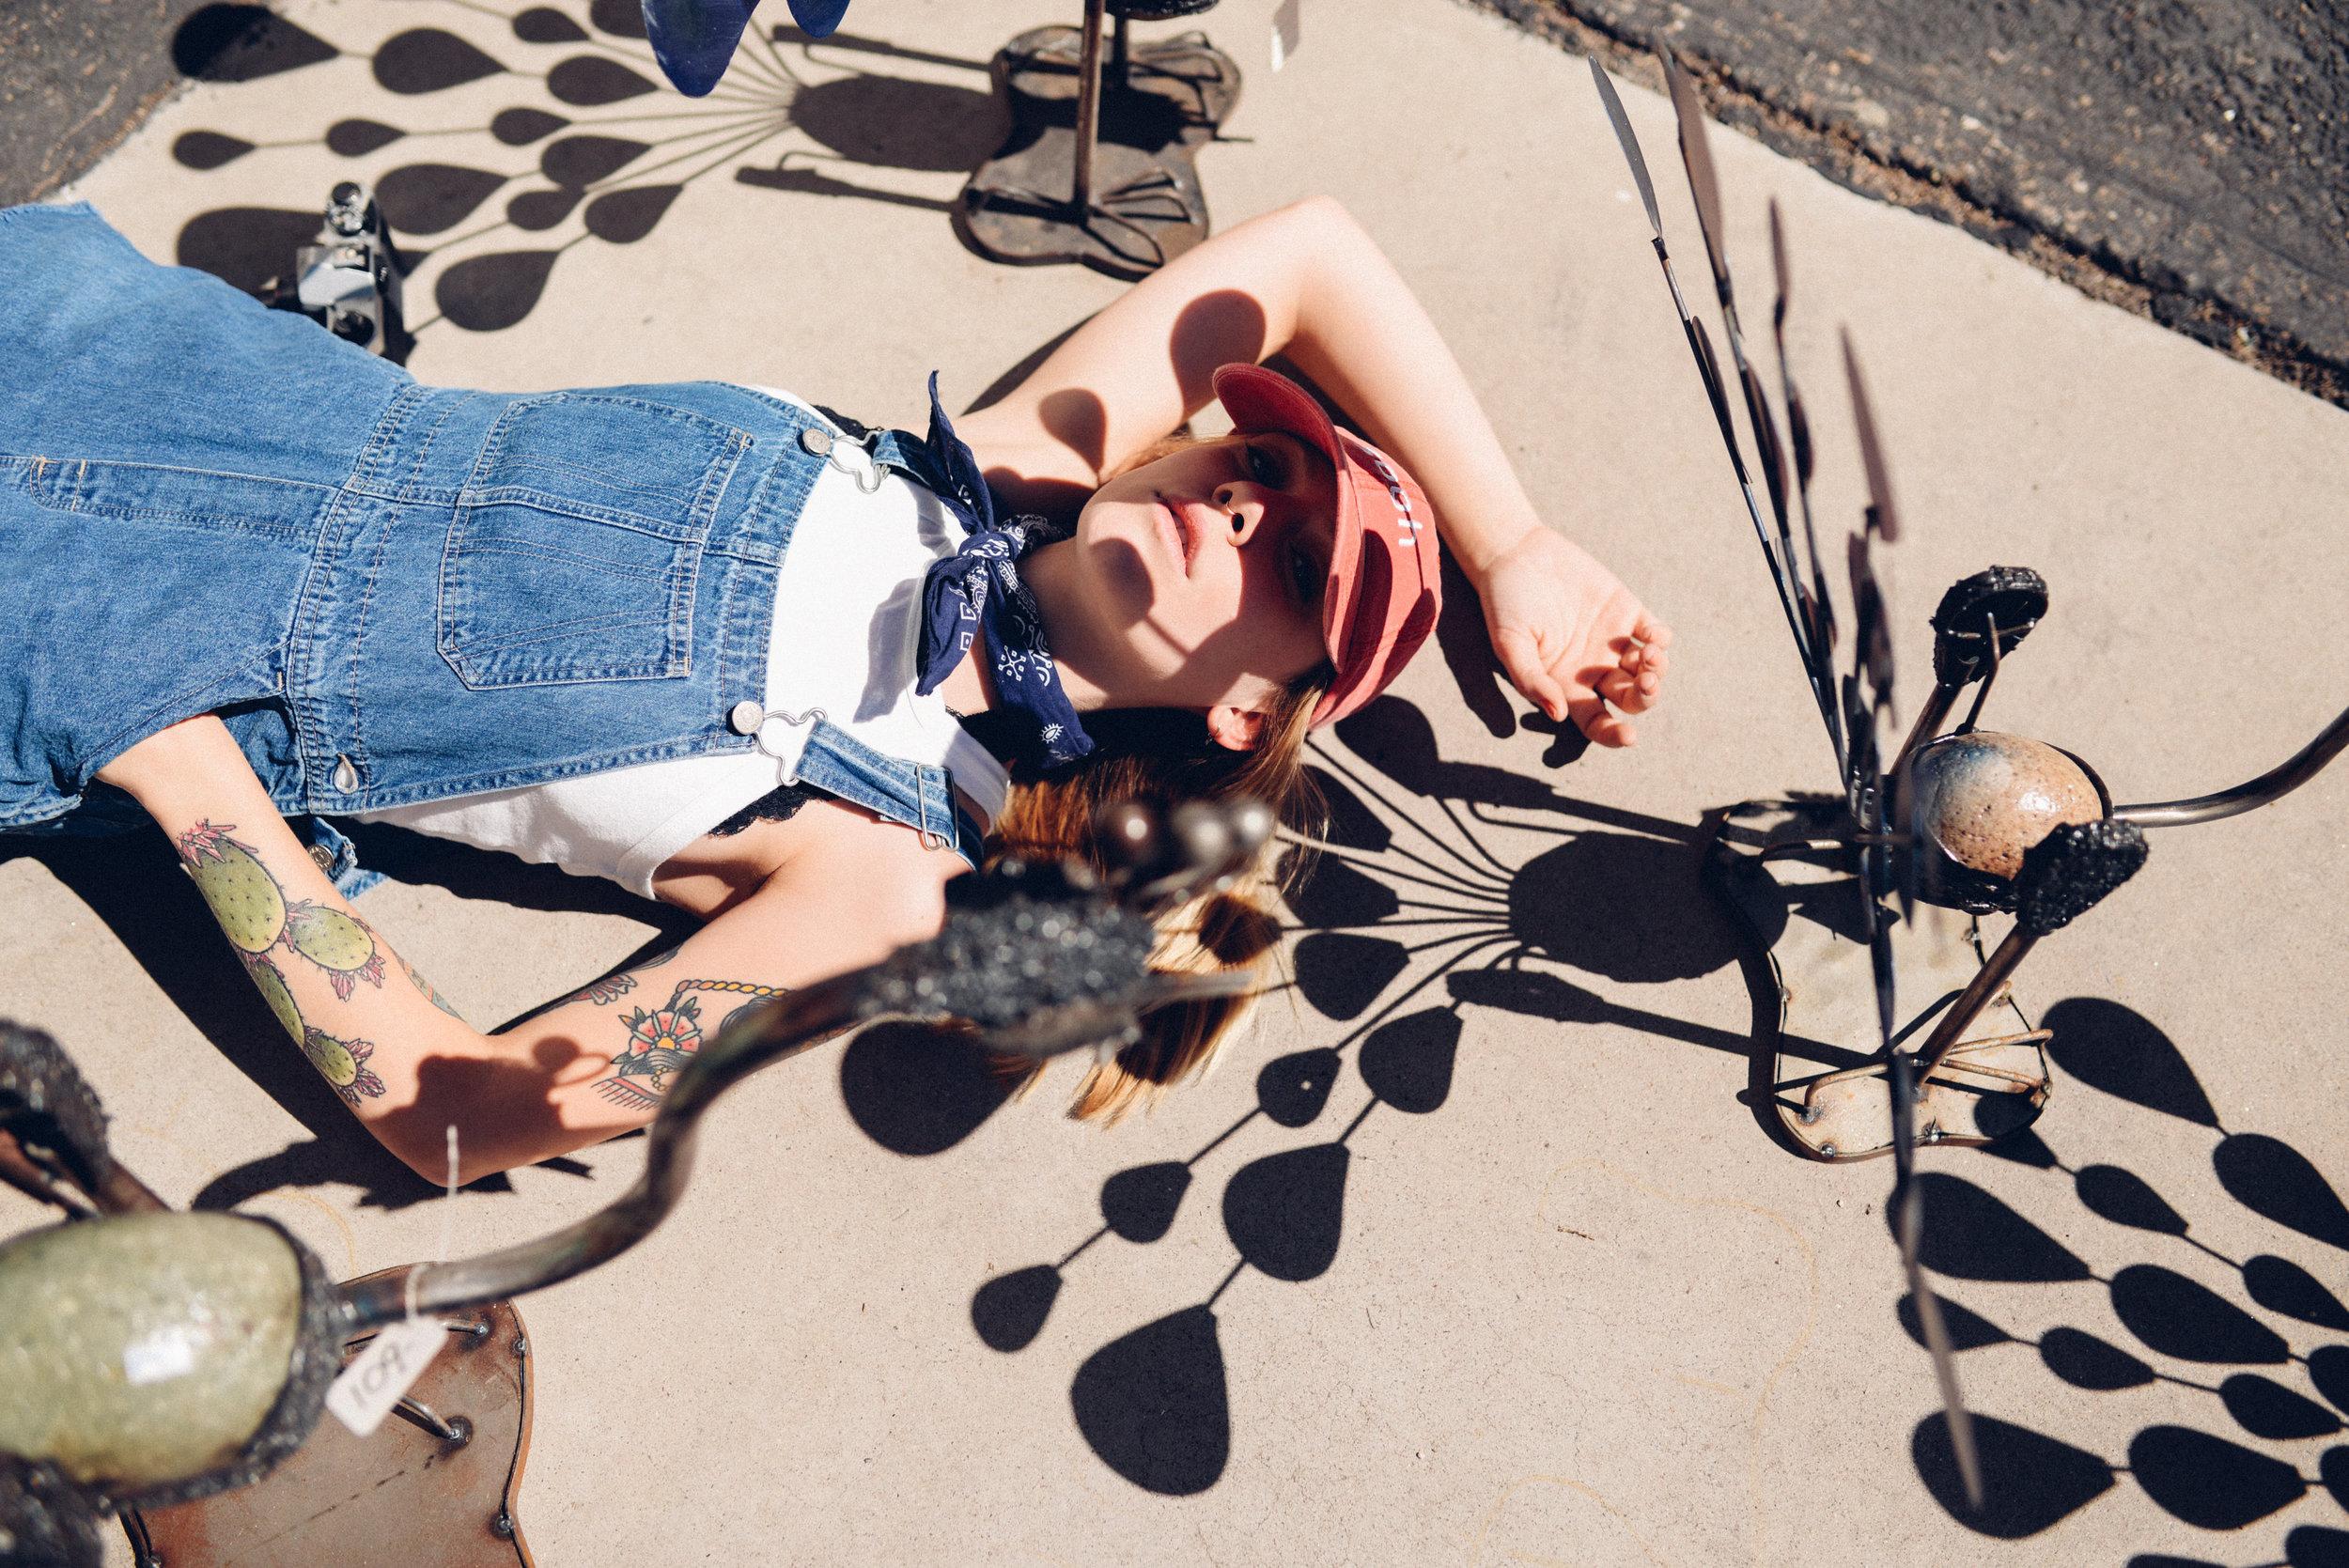 sxsw fun times pictures-Edits-0003.jpg